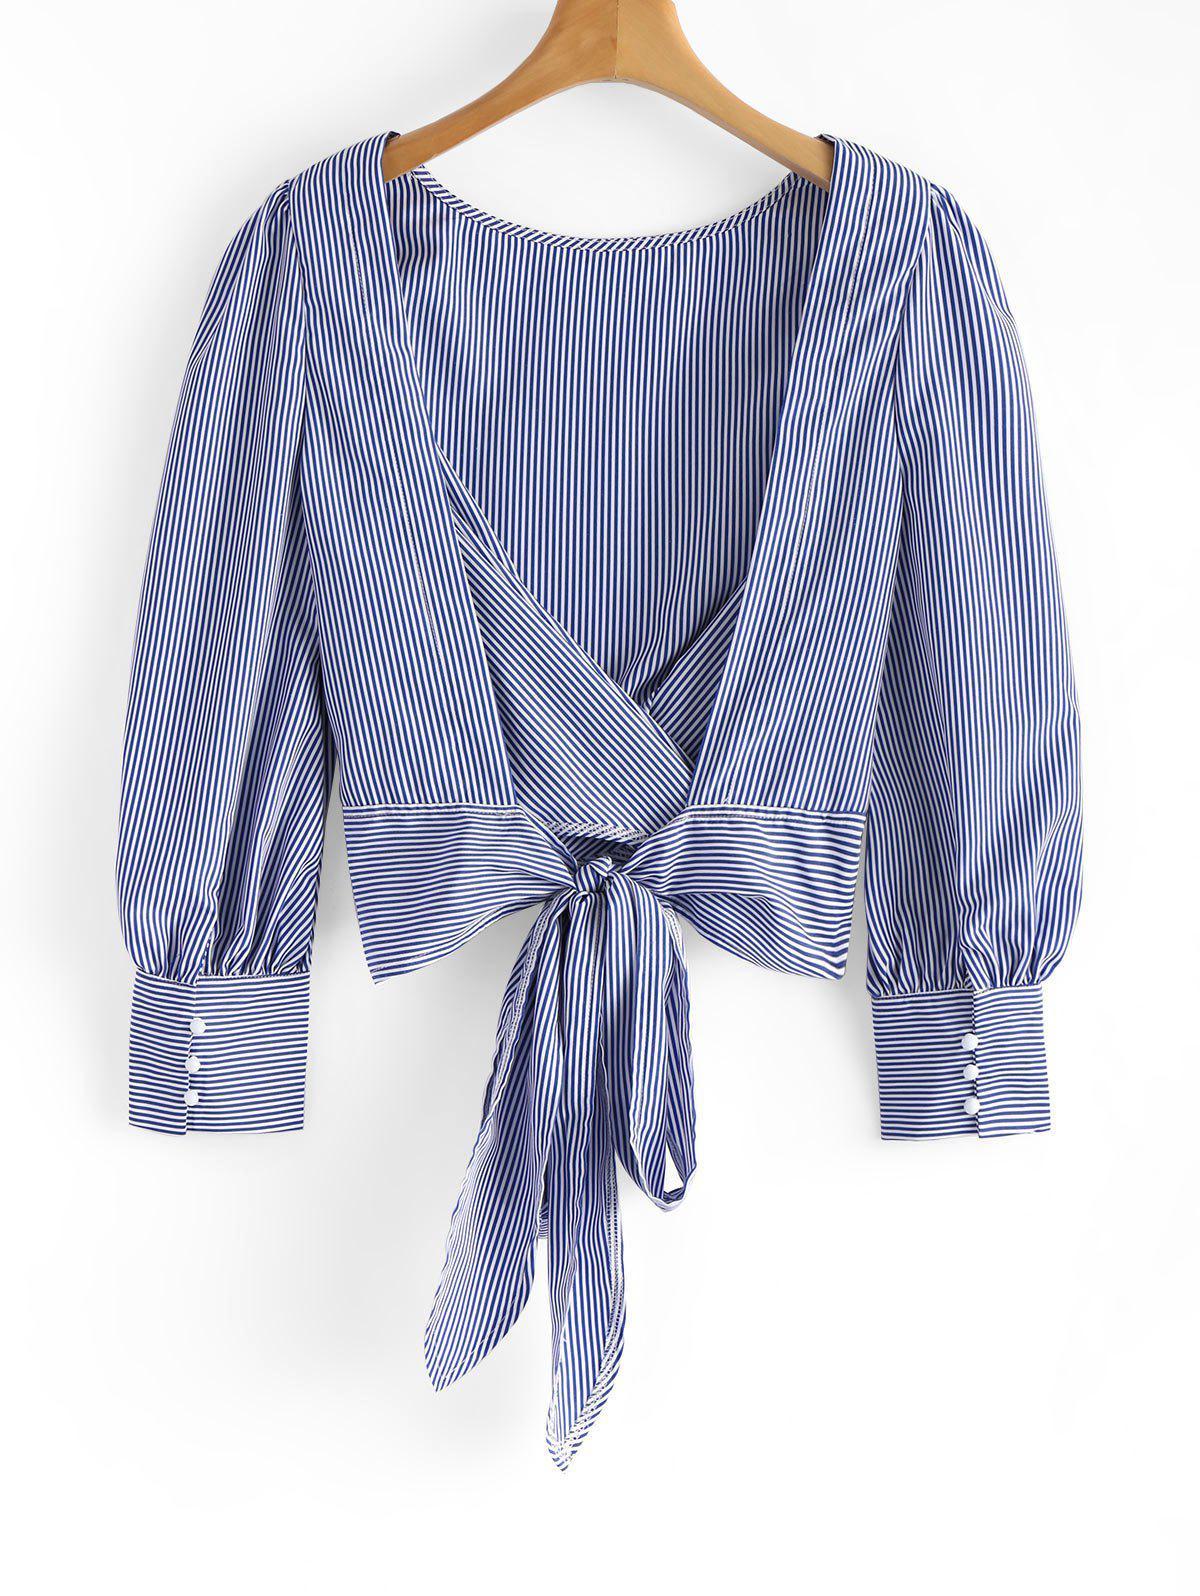 Gebundene bowknot rckenfreie gestreifte Bluse